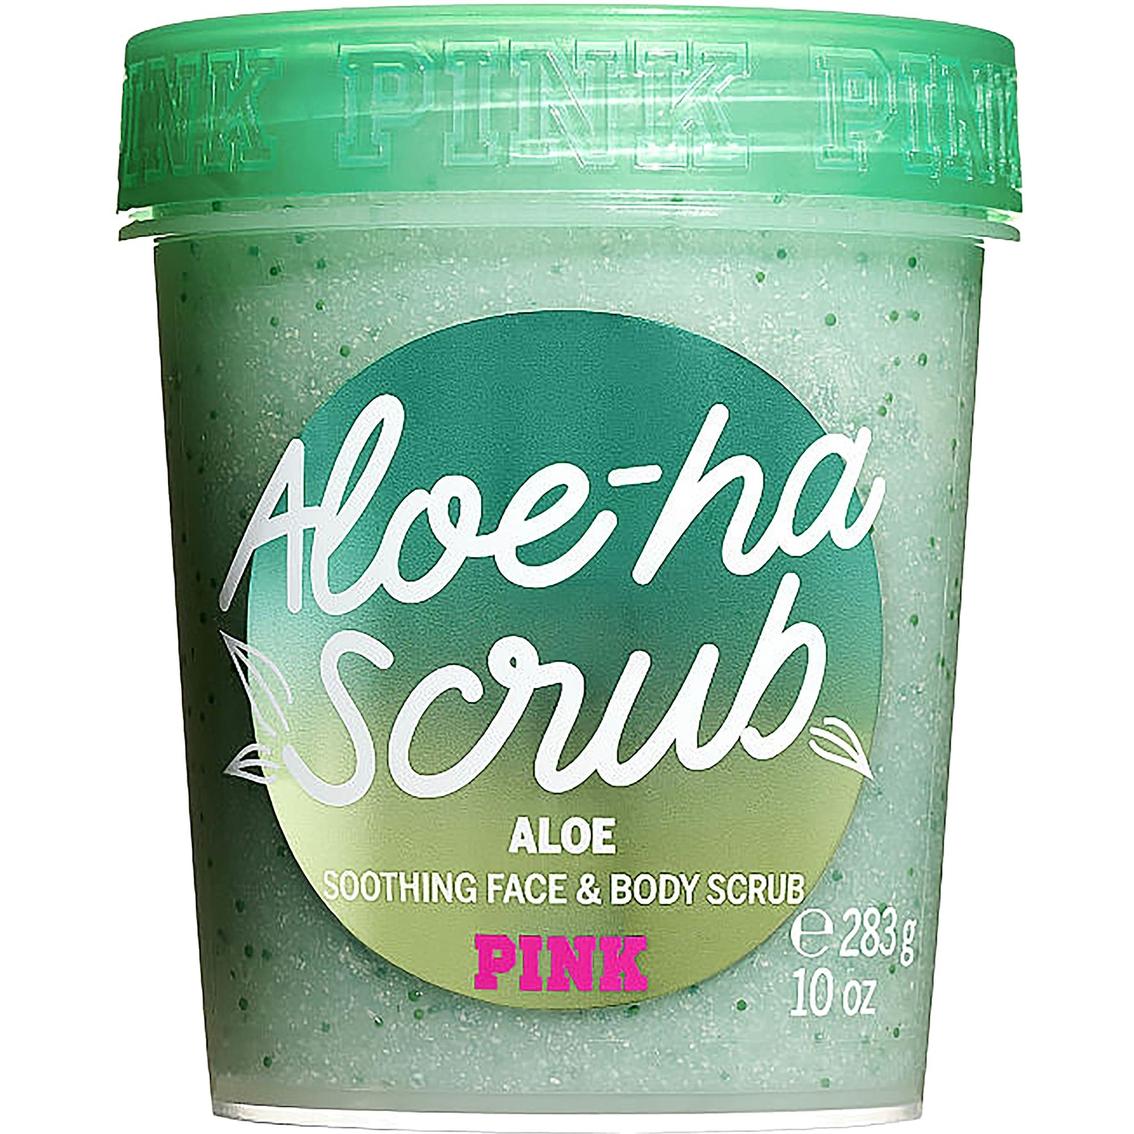 a3d3ec12b66f6 Victoria's Secret Pink Aloe Body Scrub 10 Oz. | Fragrance | Beauty ...